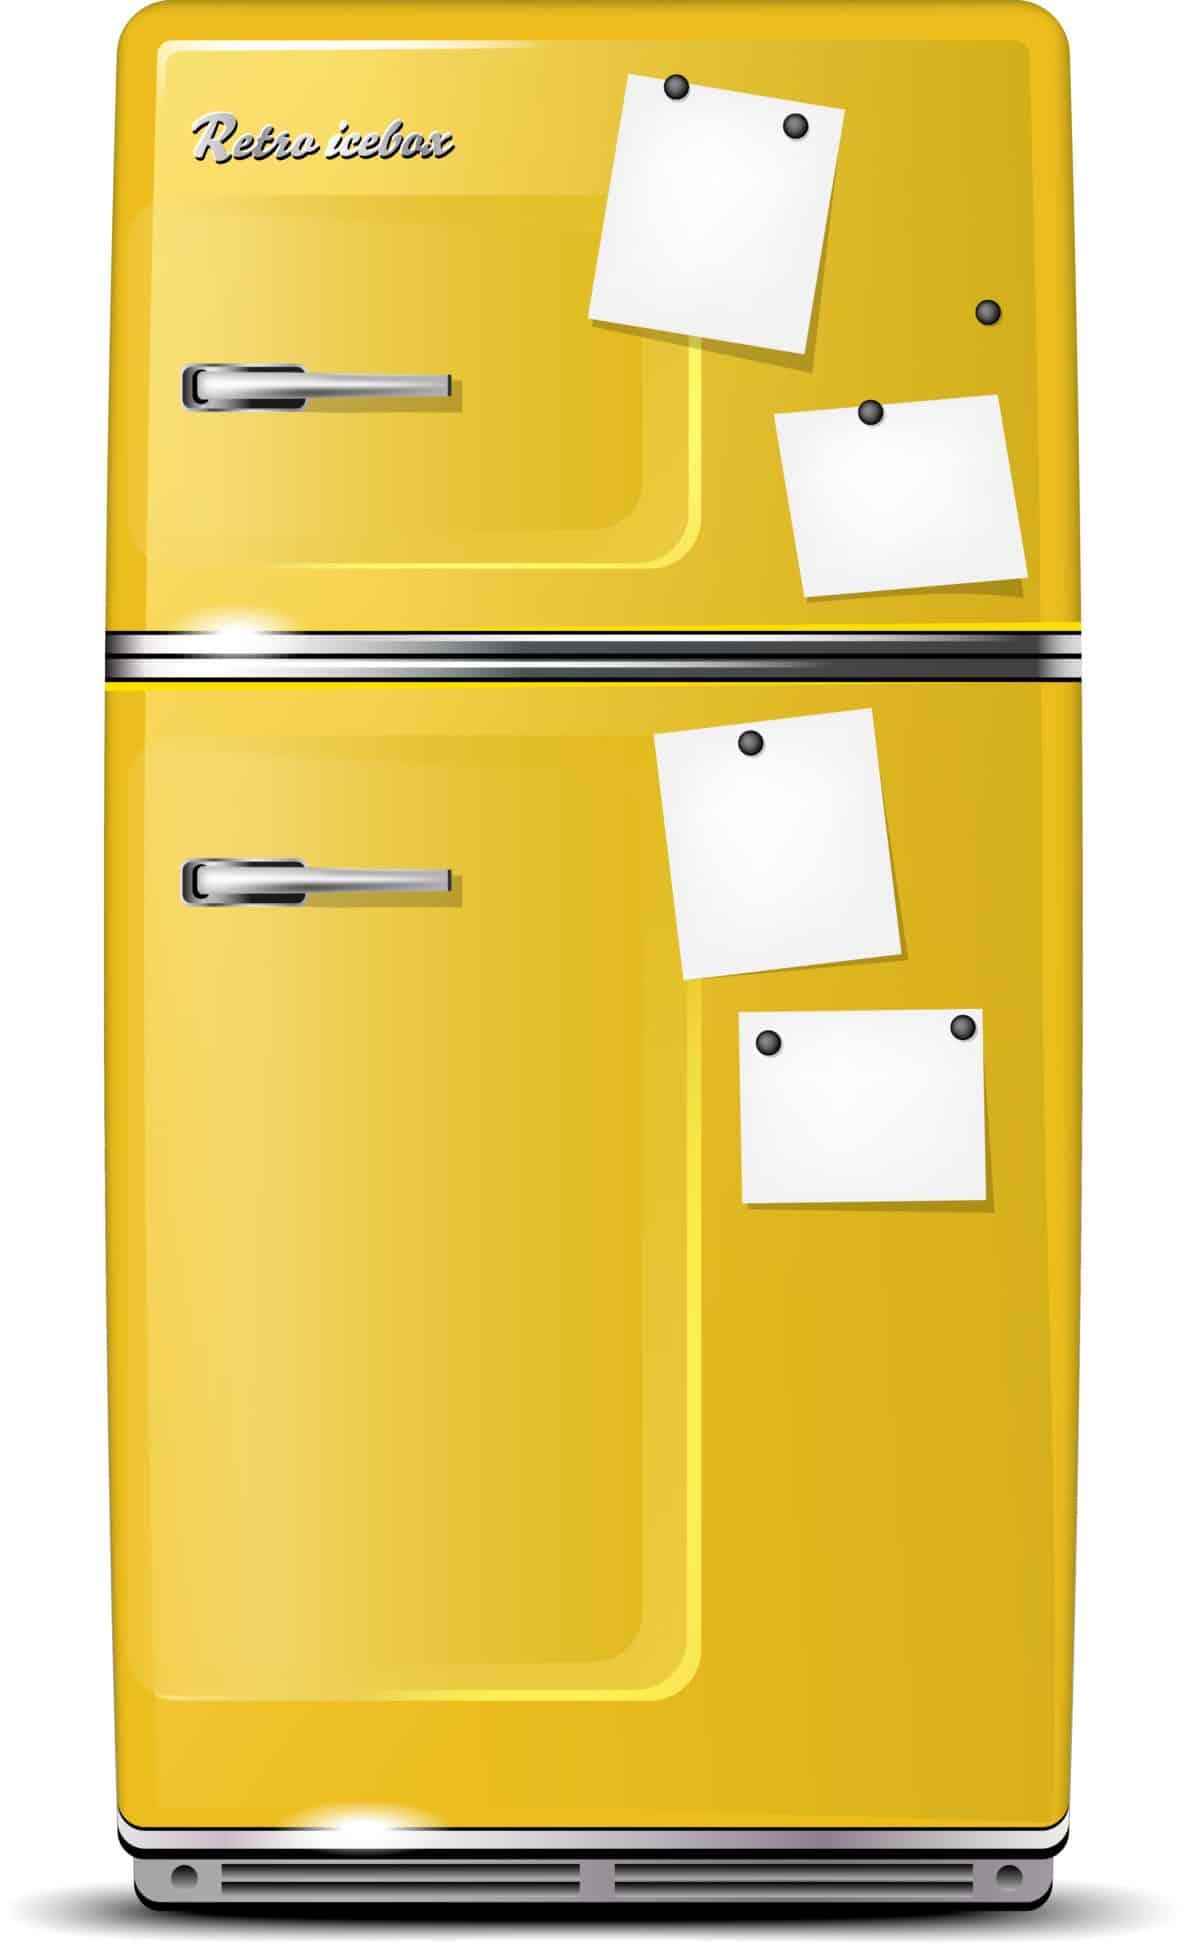 refrigerator yellow